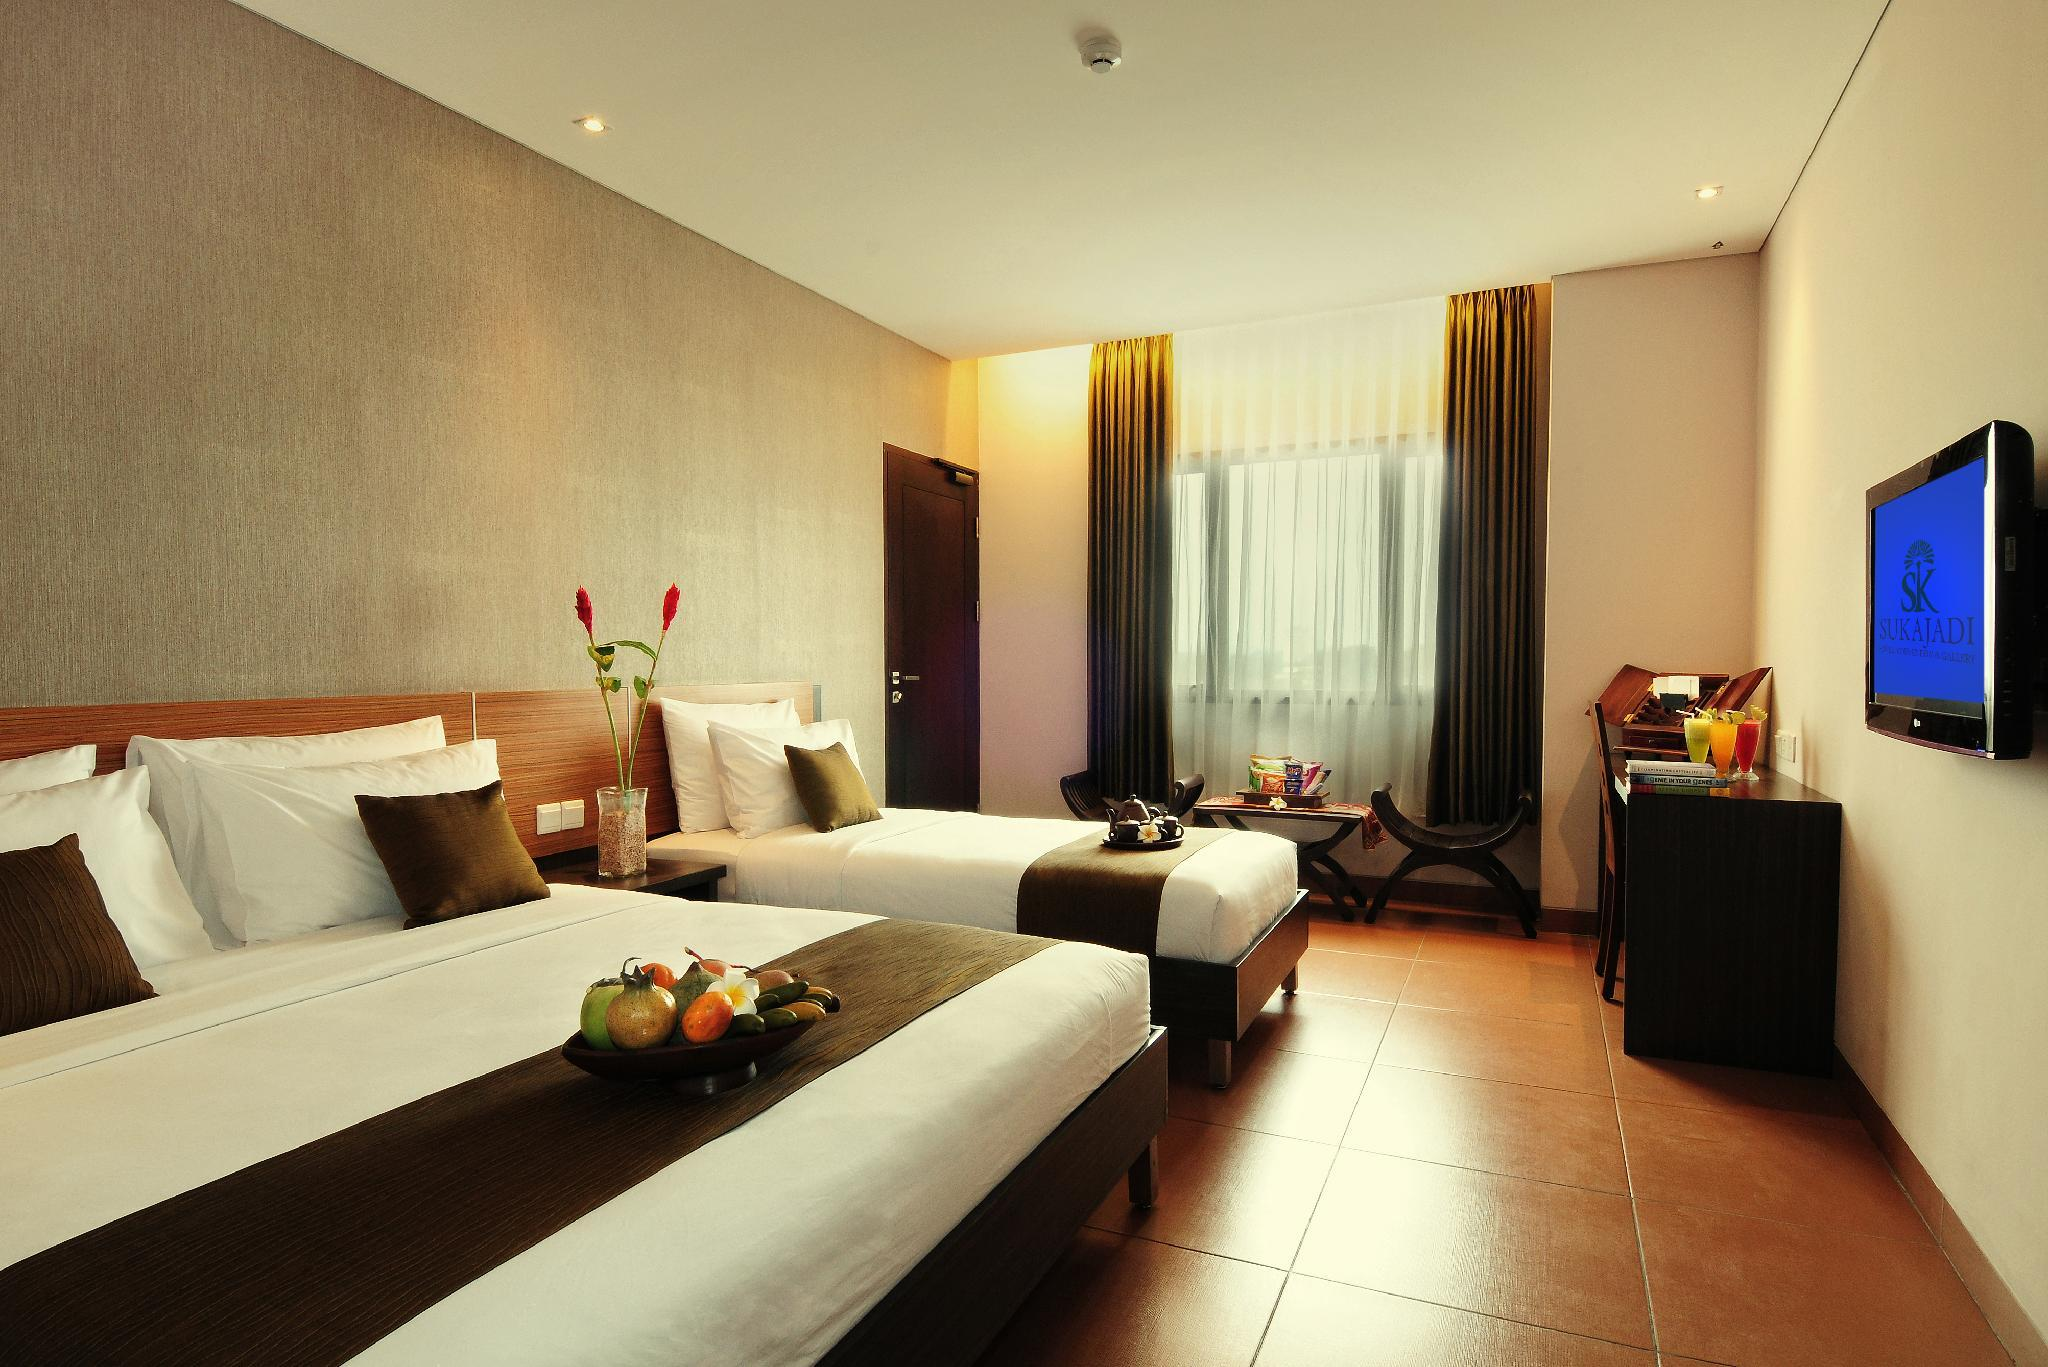 Sukajadi Hotel Bandung Promo Terbaru 2020 Rp 179038 Foto Hd Ulasan